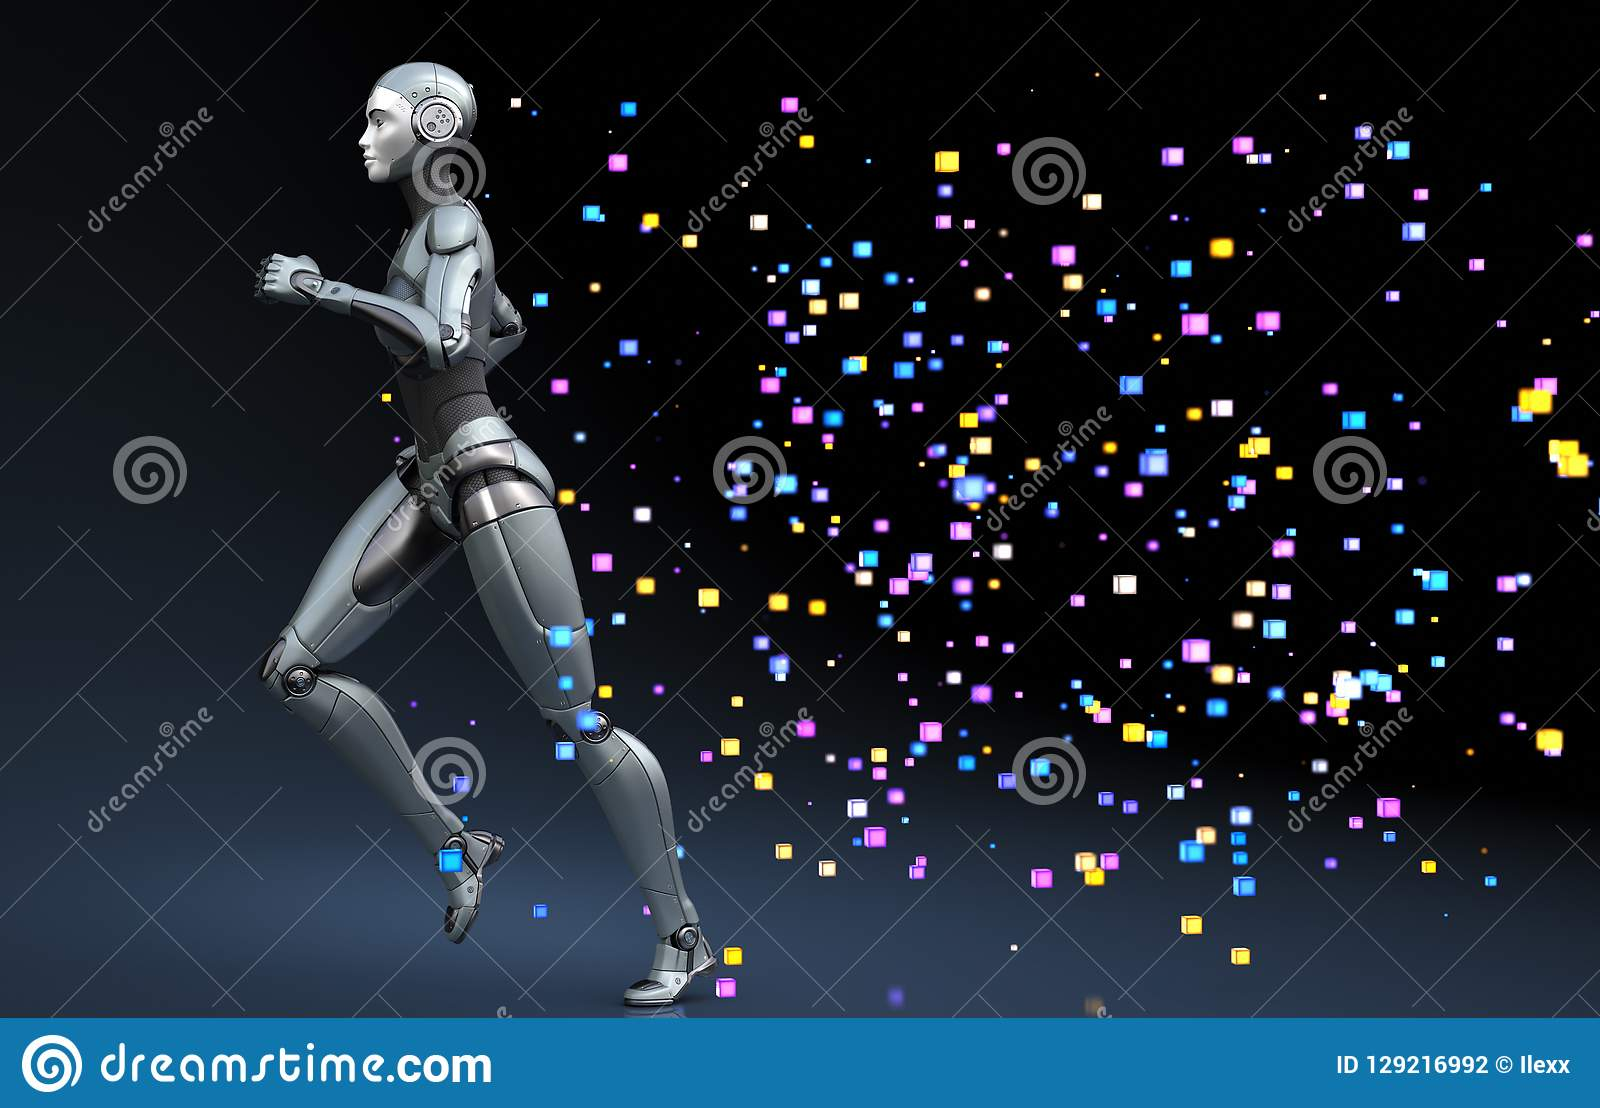 Robot corriente que sale de un rastro de pixeles